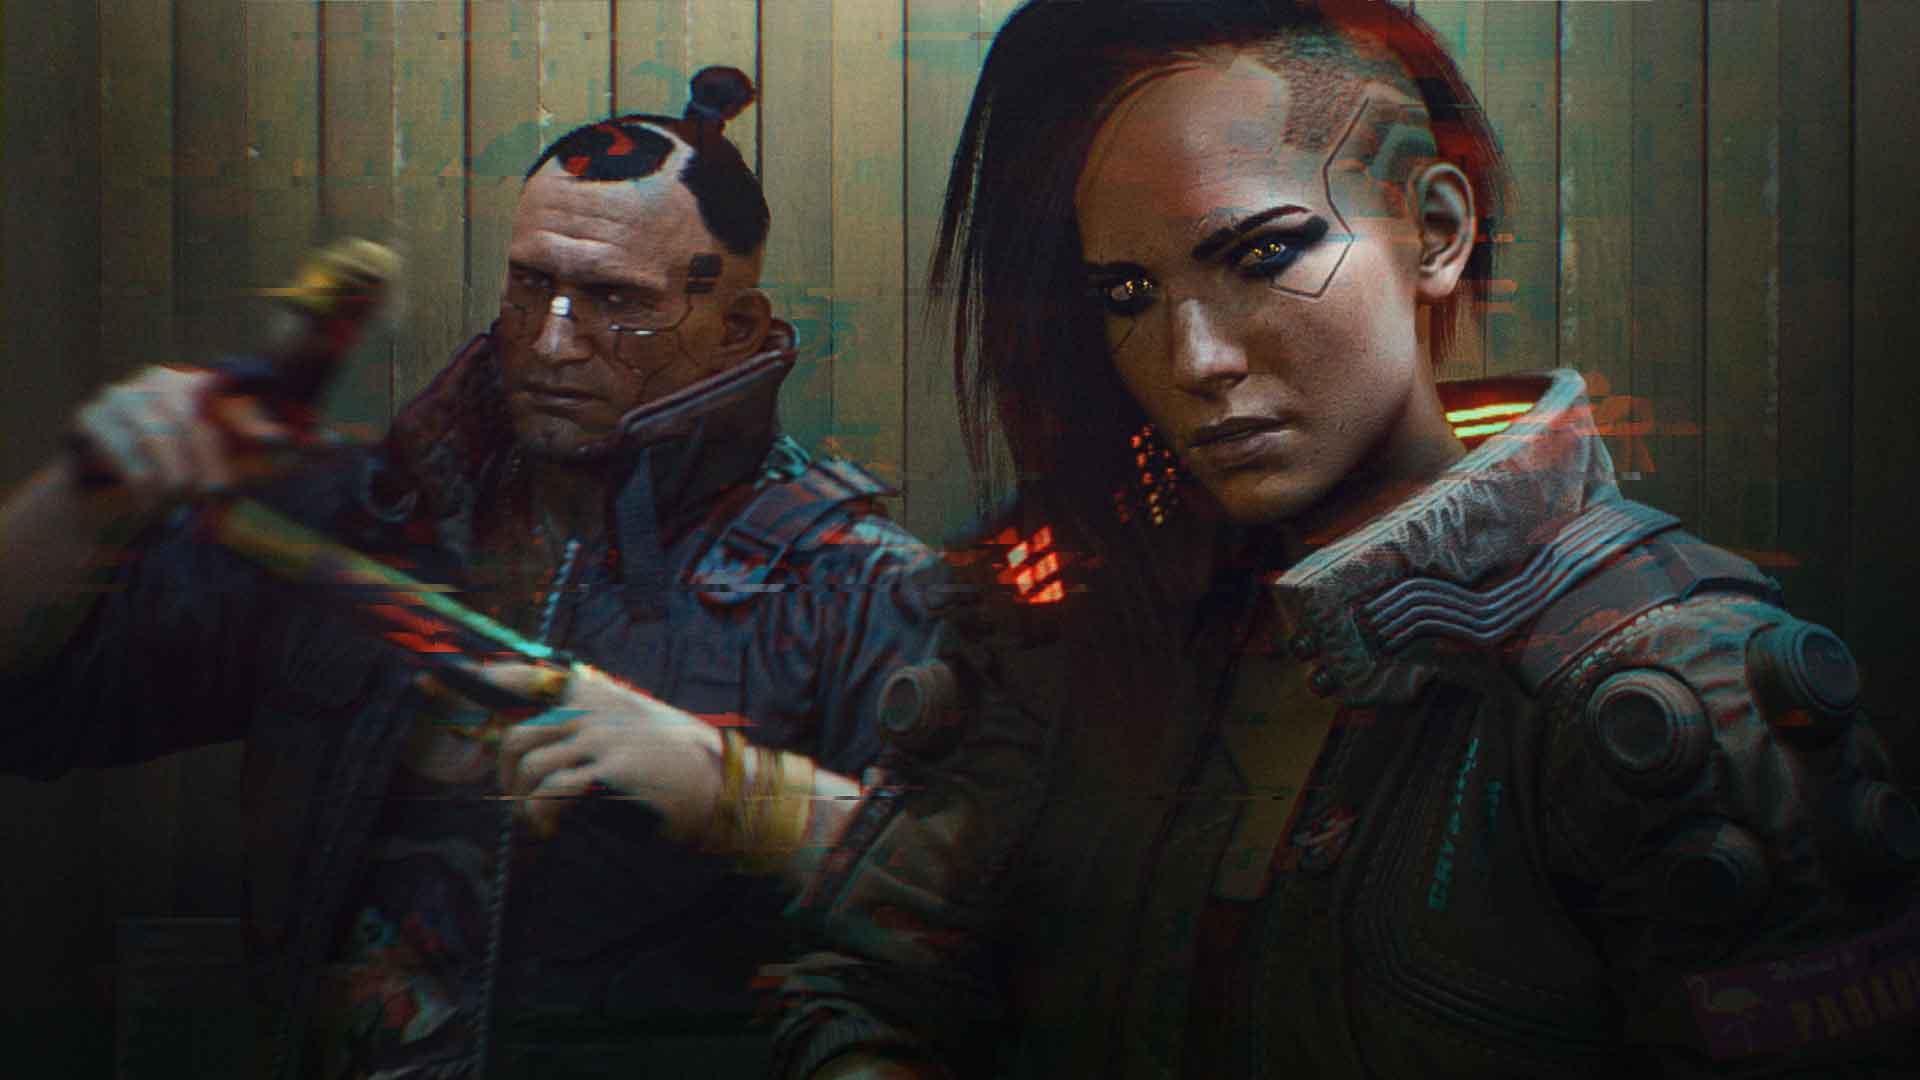 Glitched no text 1920x1080 PR - نقد و برسی بازی Cyberpunk 2077